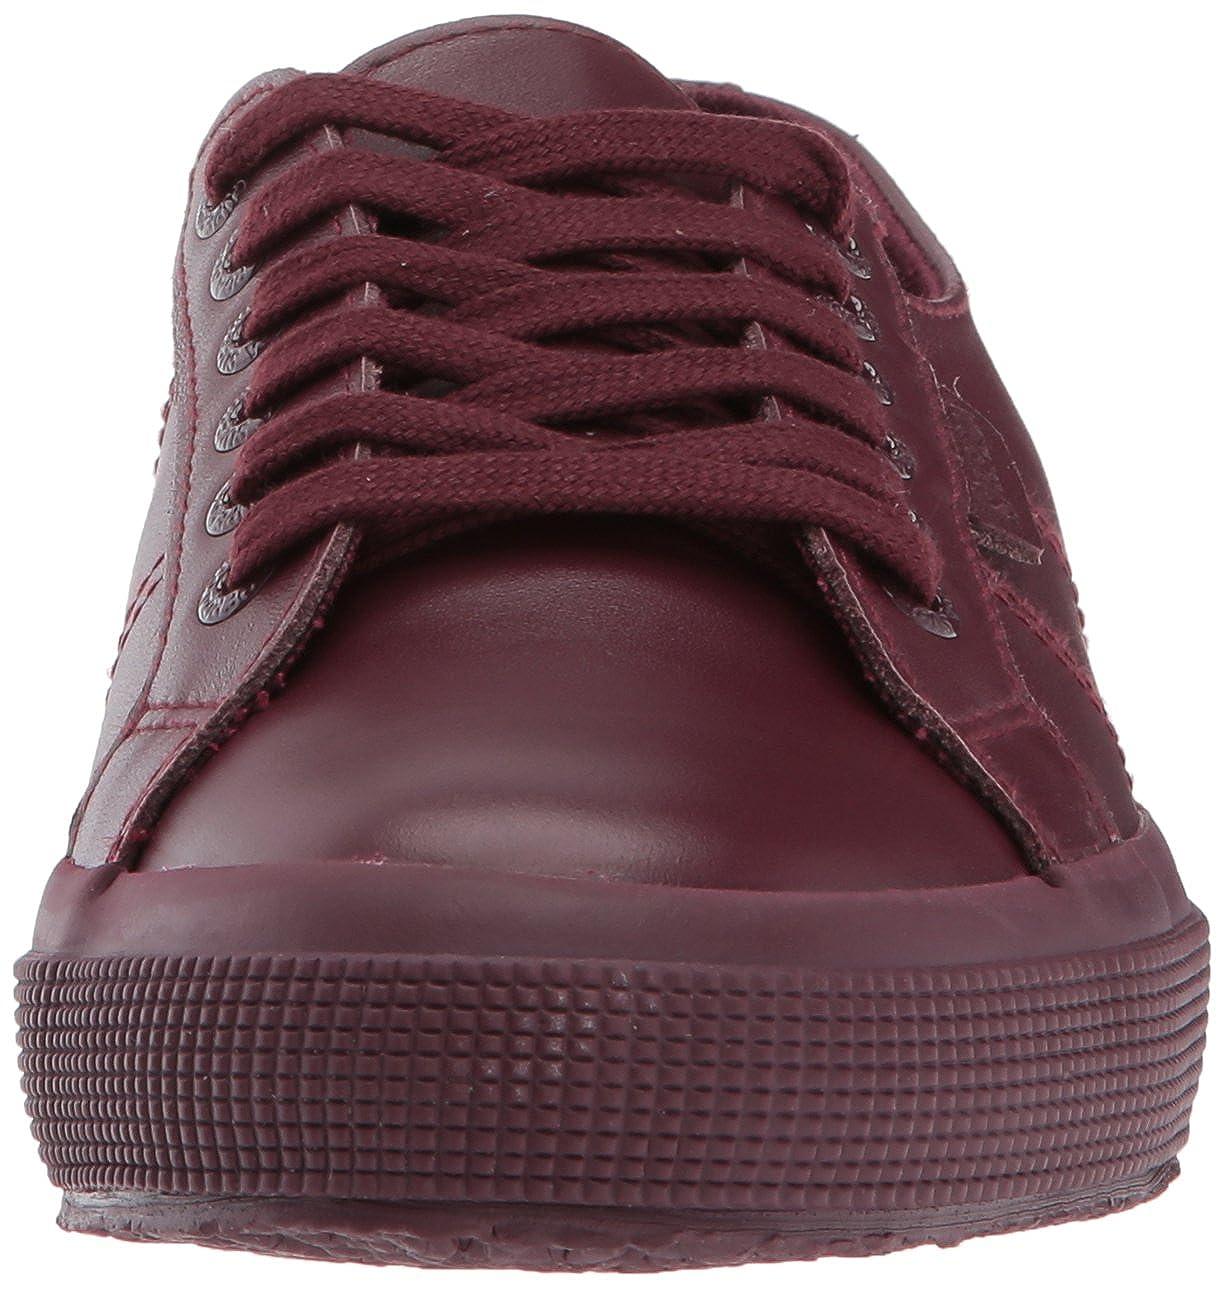 Superga Women's 2750 Wt Fglu Wt 2750 Fashion Sneaker B072Q35S87 Fashion Sneakers f19502